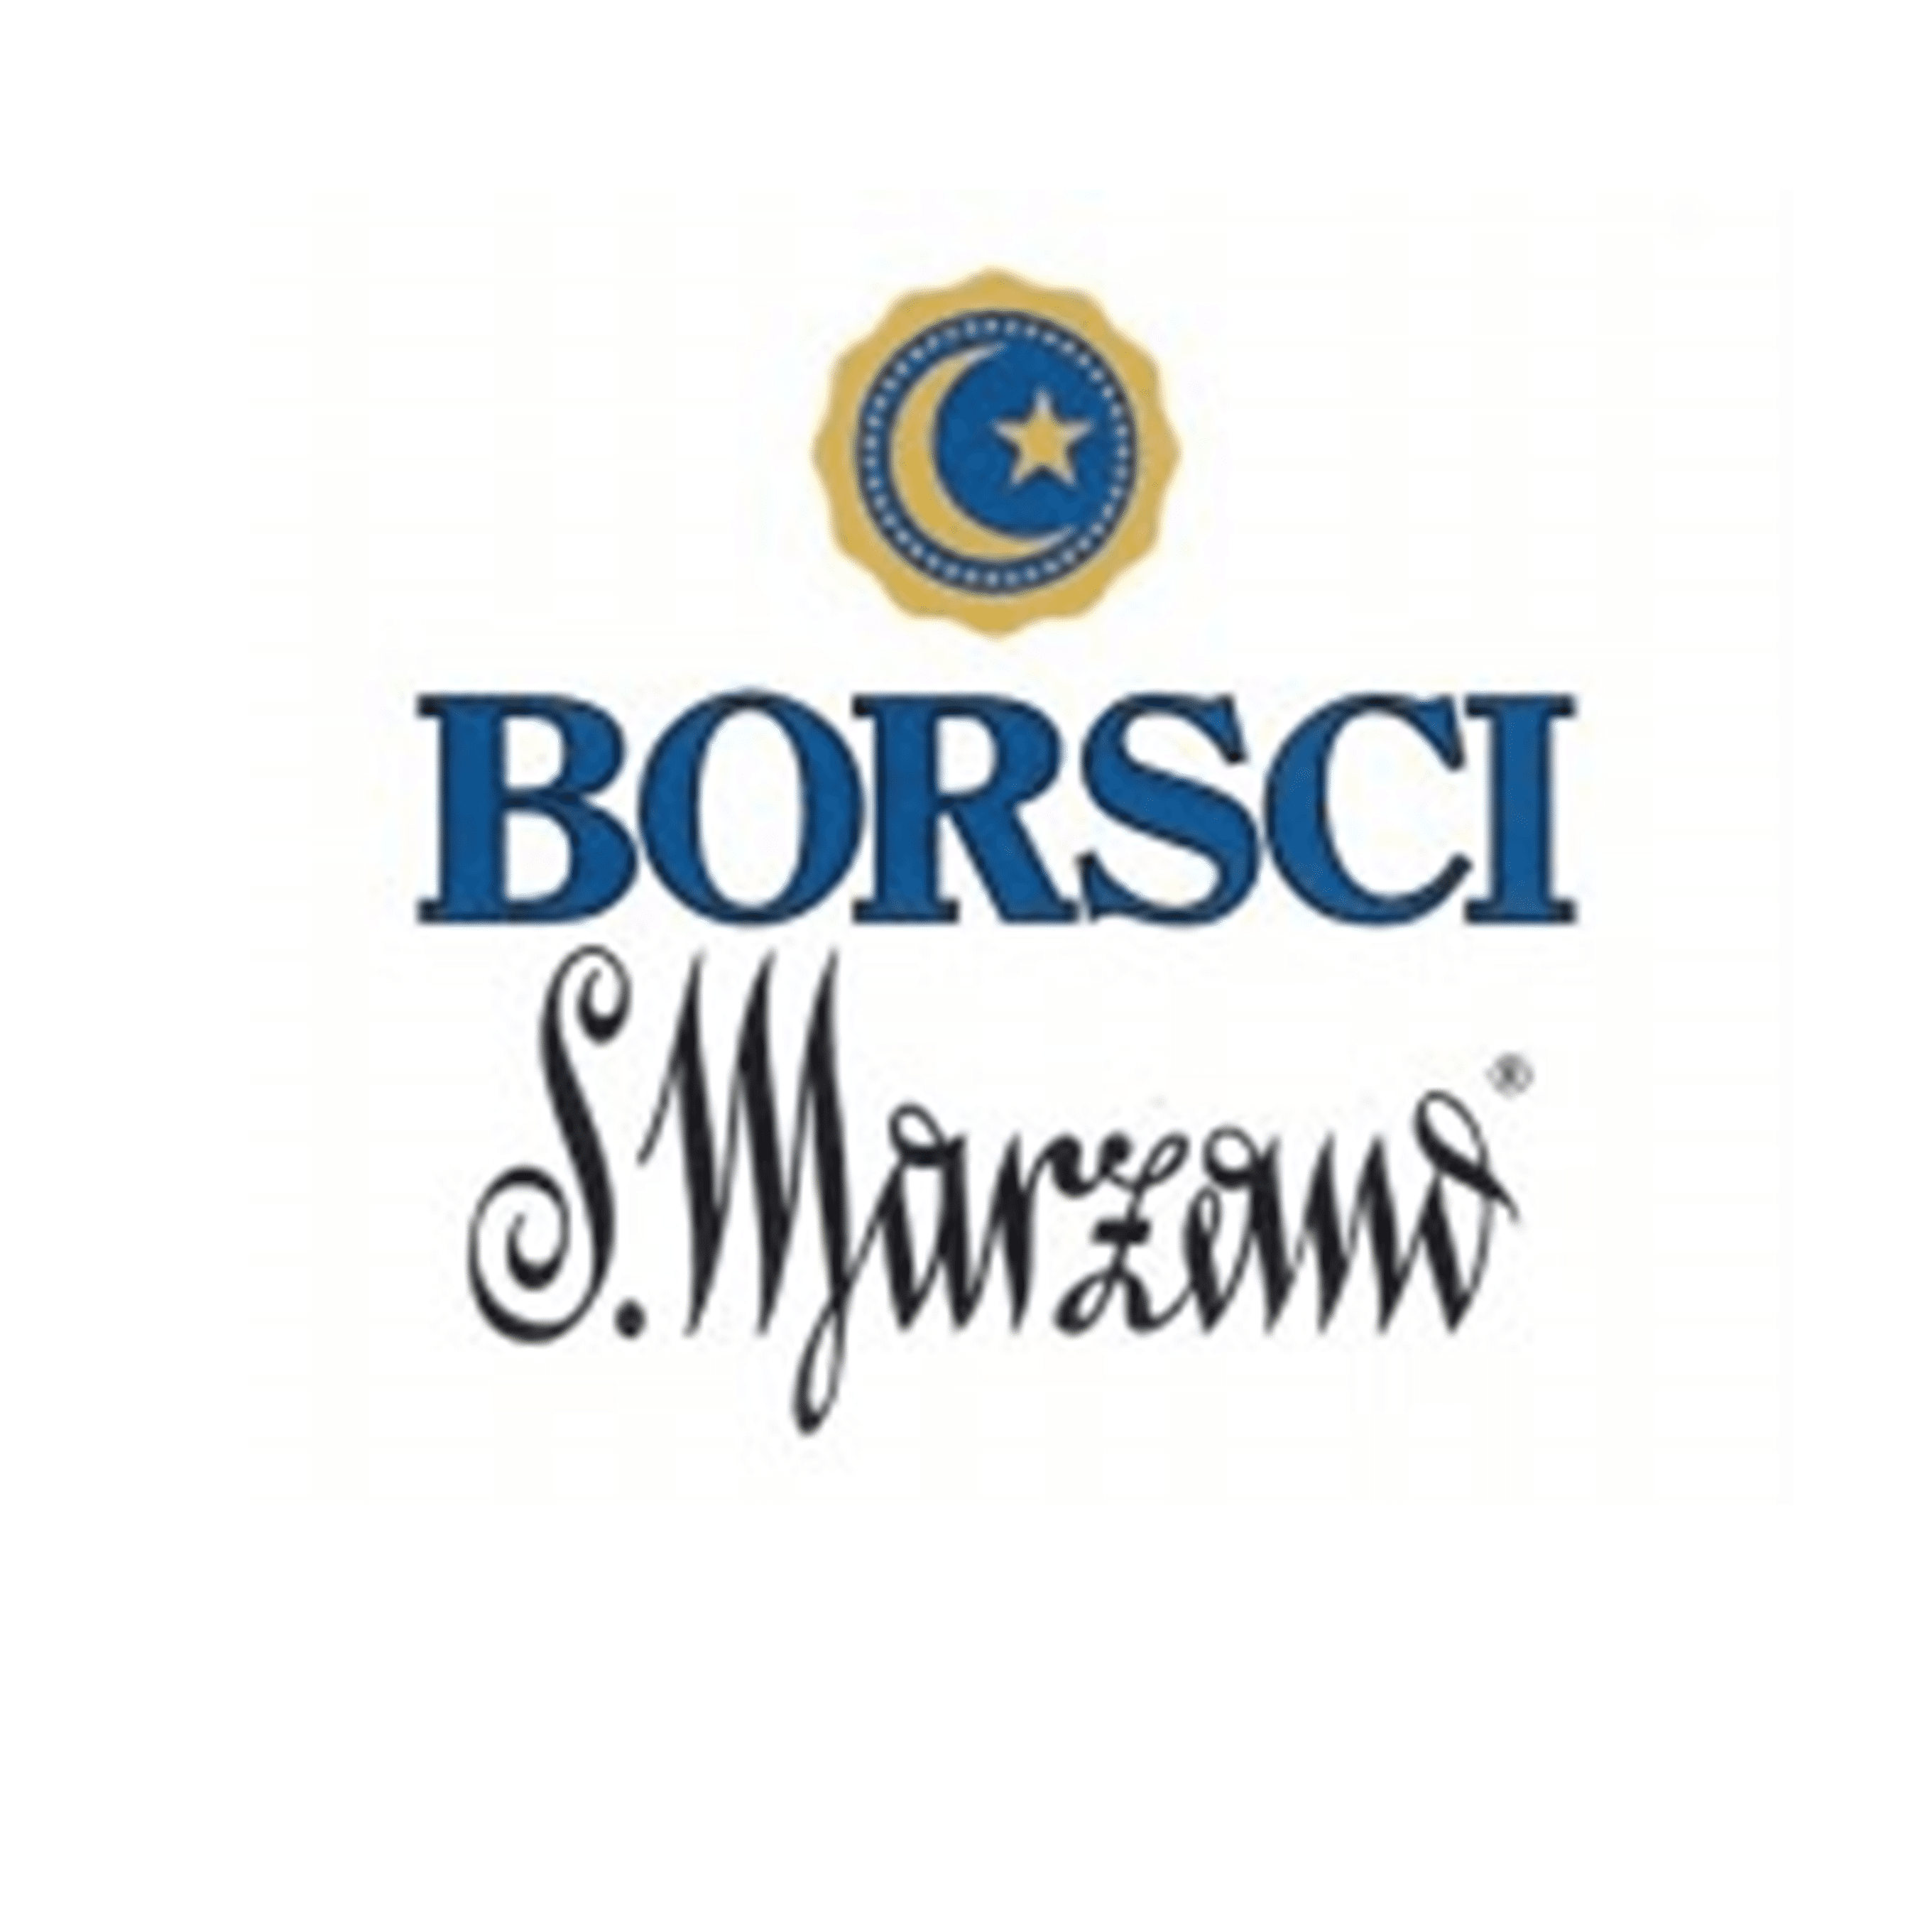 borsci-elisir-san-marzano